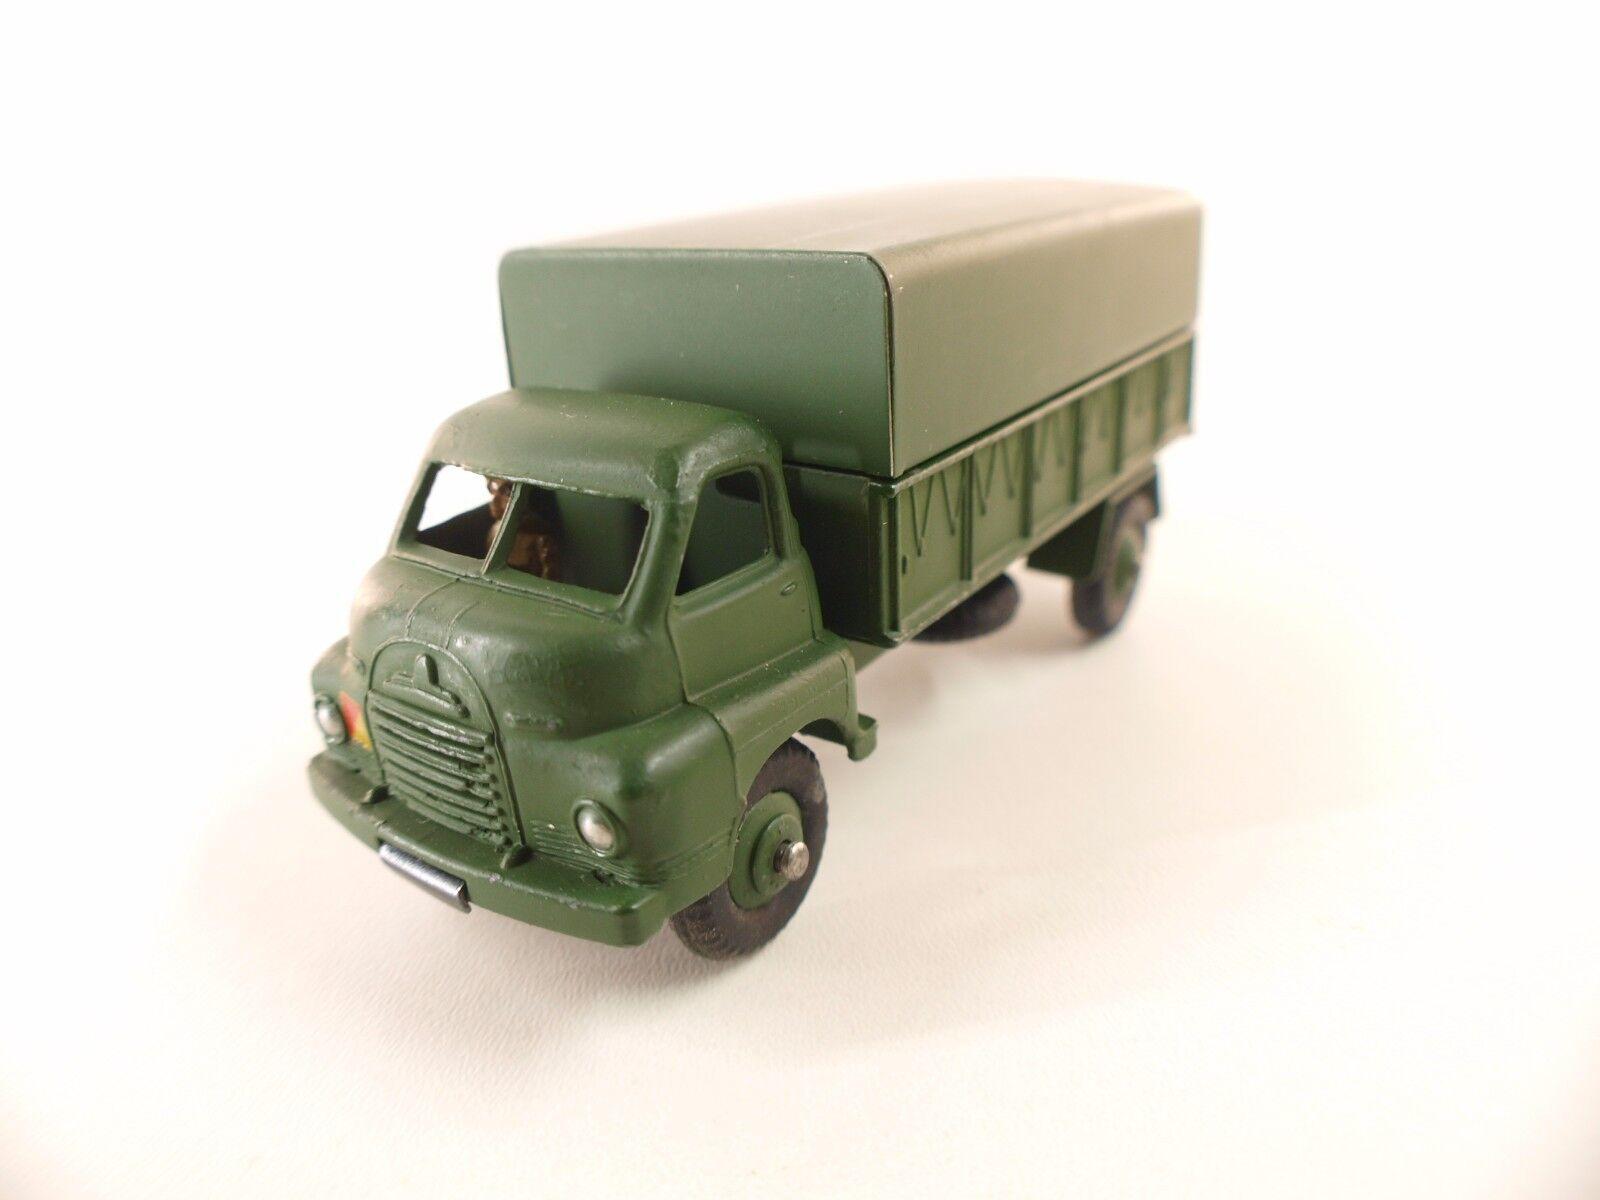 spedizione gratuita! Dinky giocattoli GB 621 3T 3T 3T Army coverosso wagon camion bâché militaire jamais joué  n ° 1 online